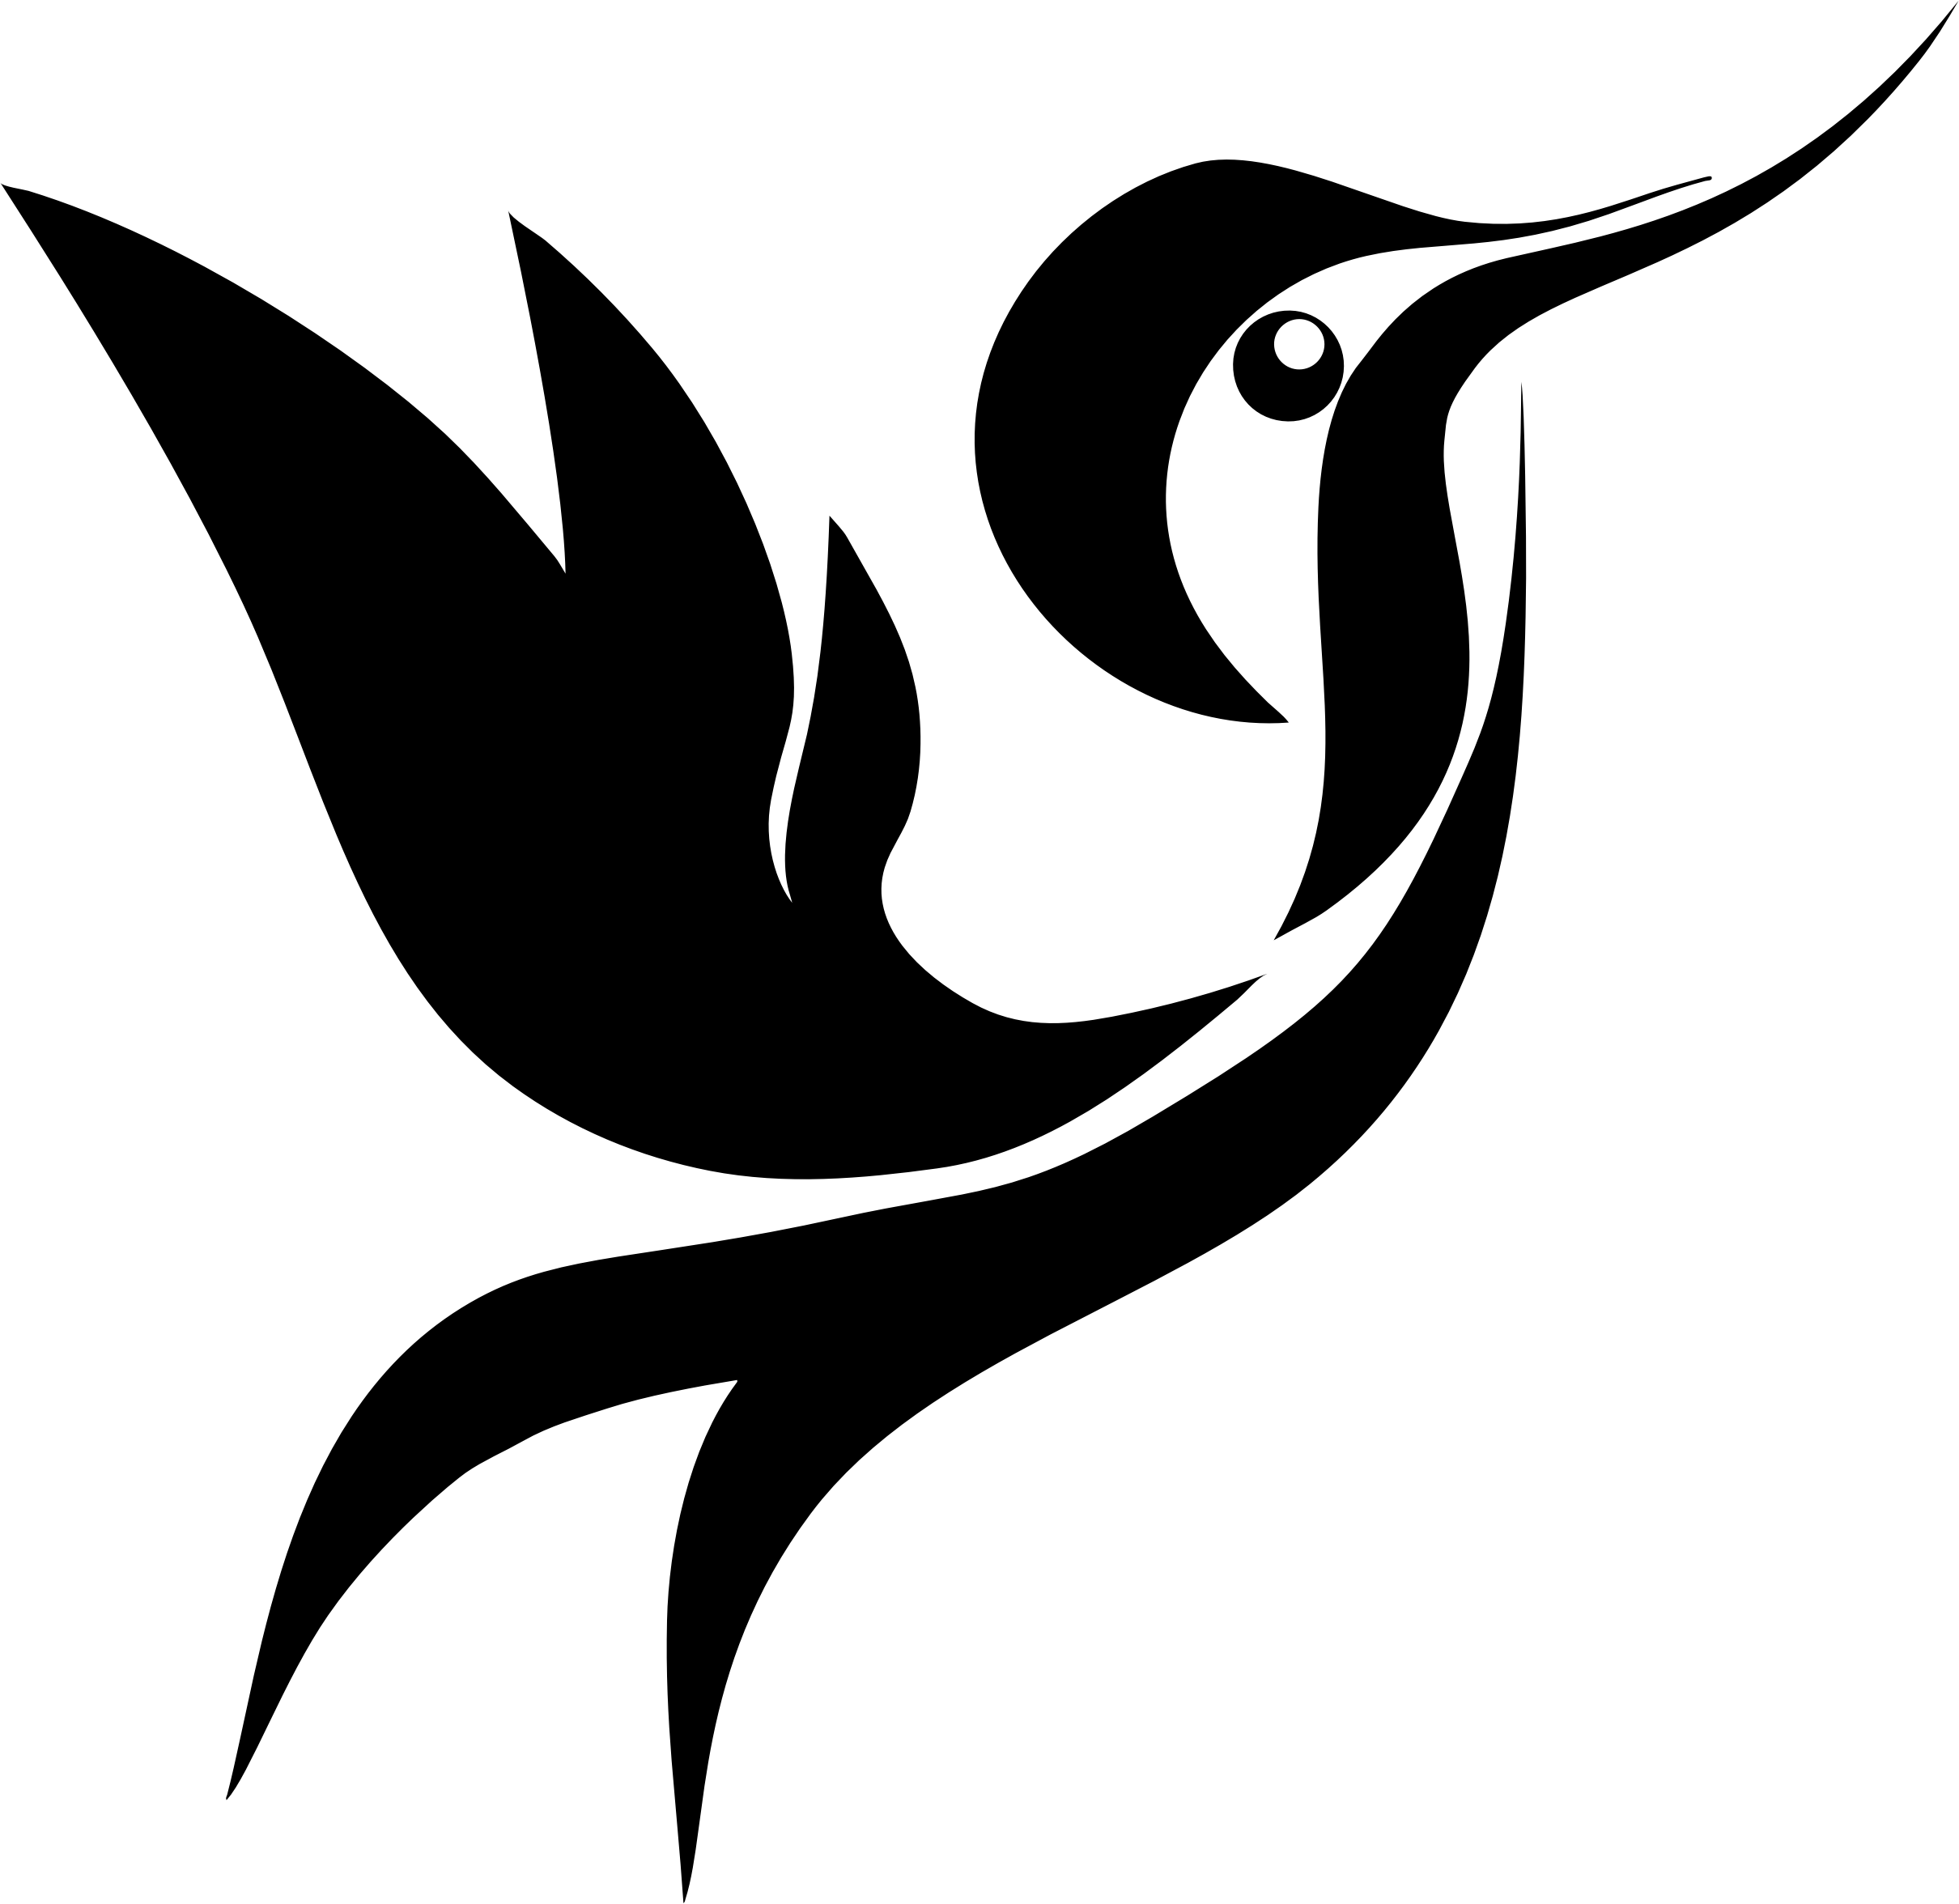 Hummingbird clipart rainbow. Bclipart stylized silhouette